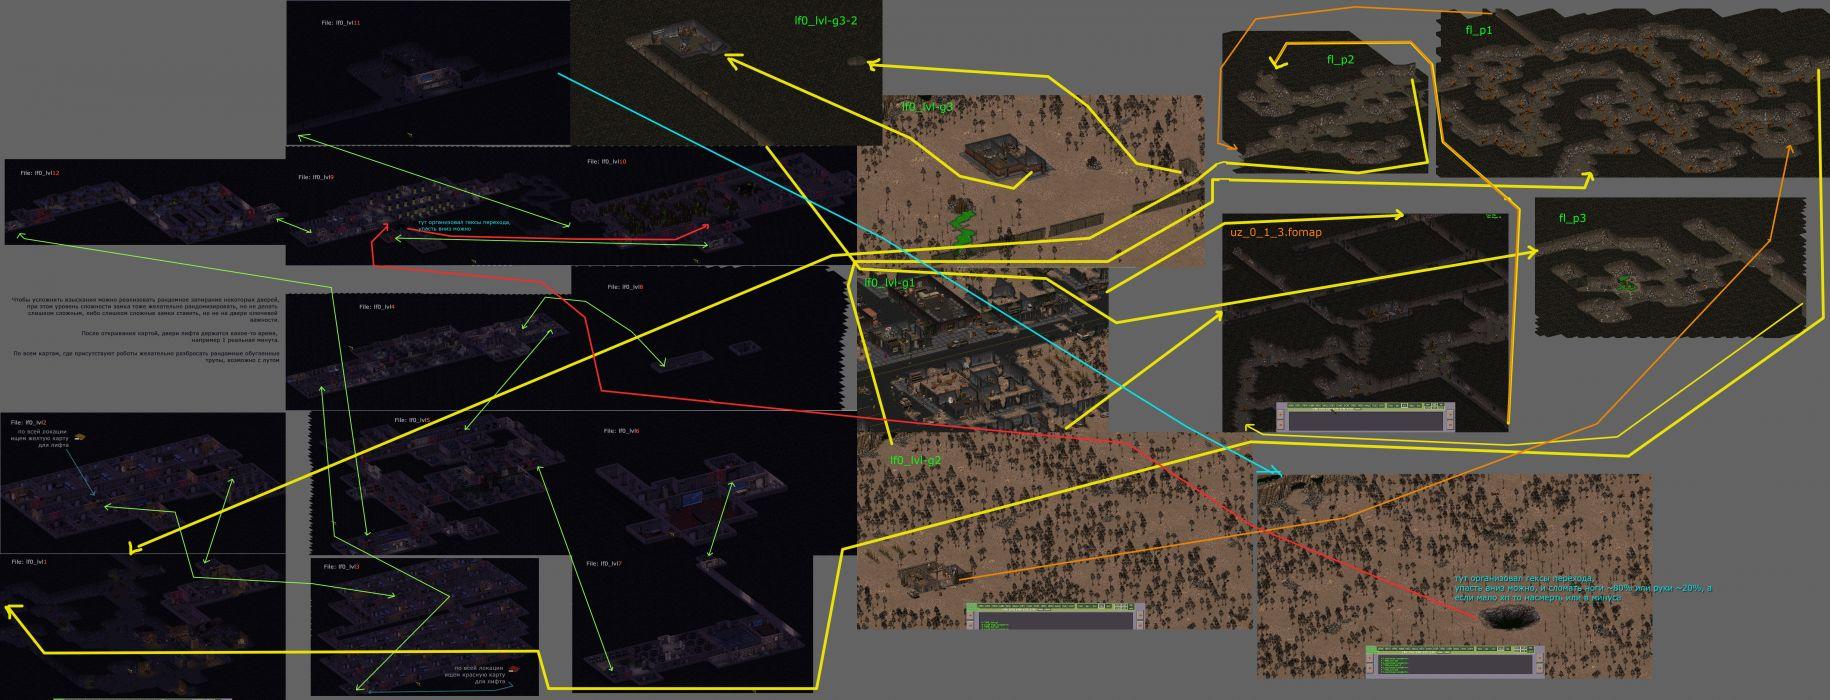 Fallout Fallout 2 bunker Fallout online Plan Fonline wallpaper